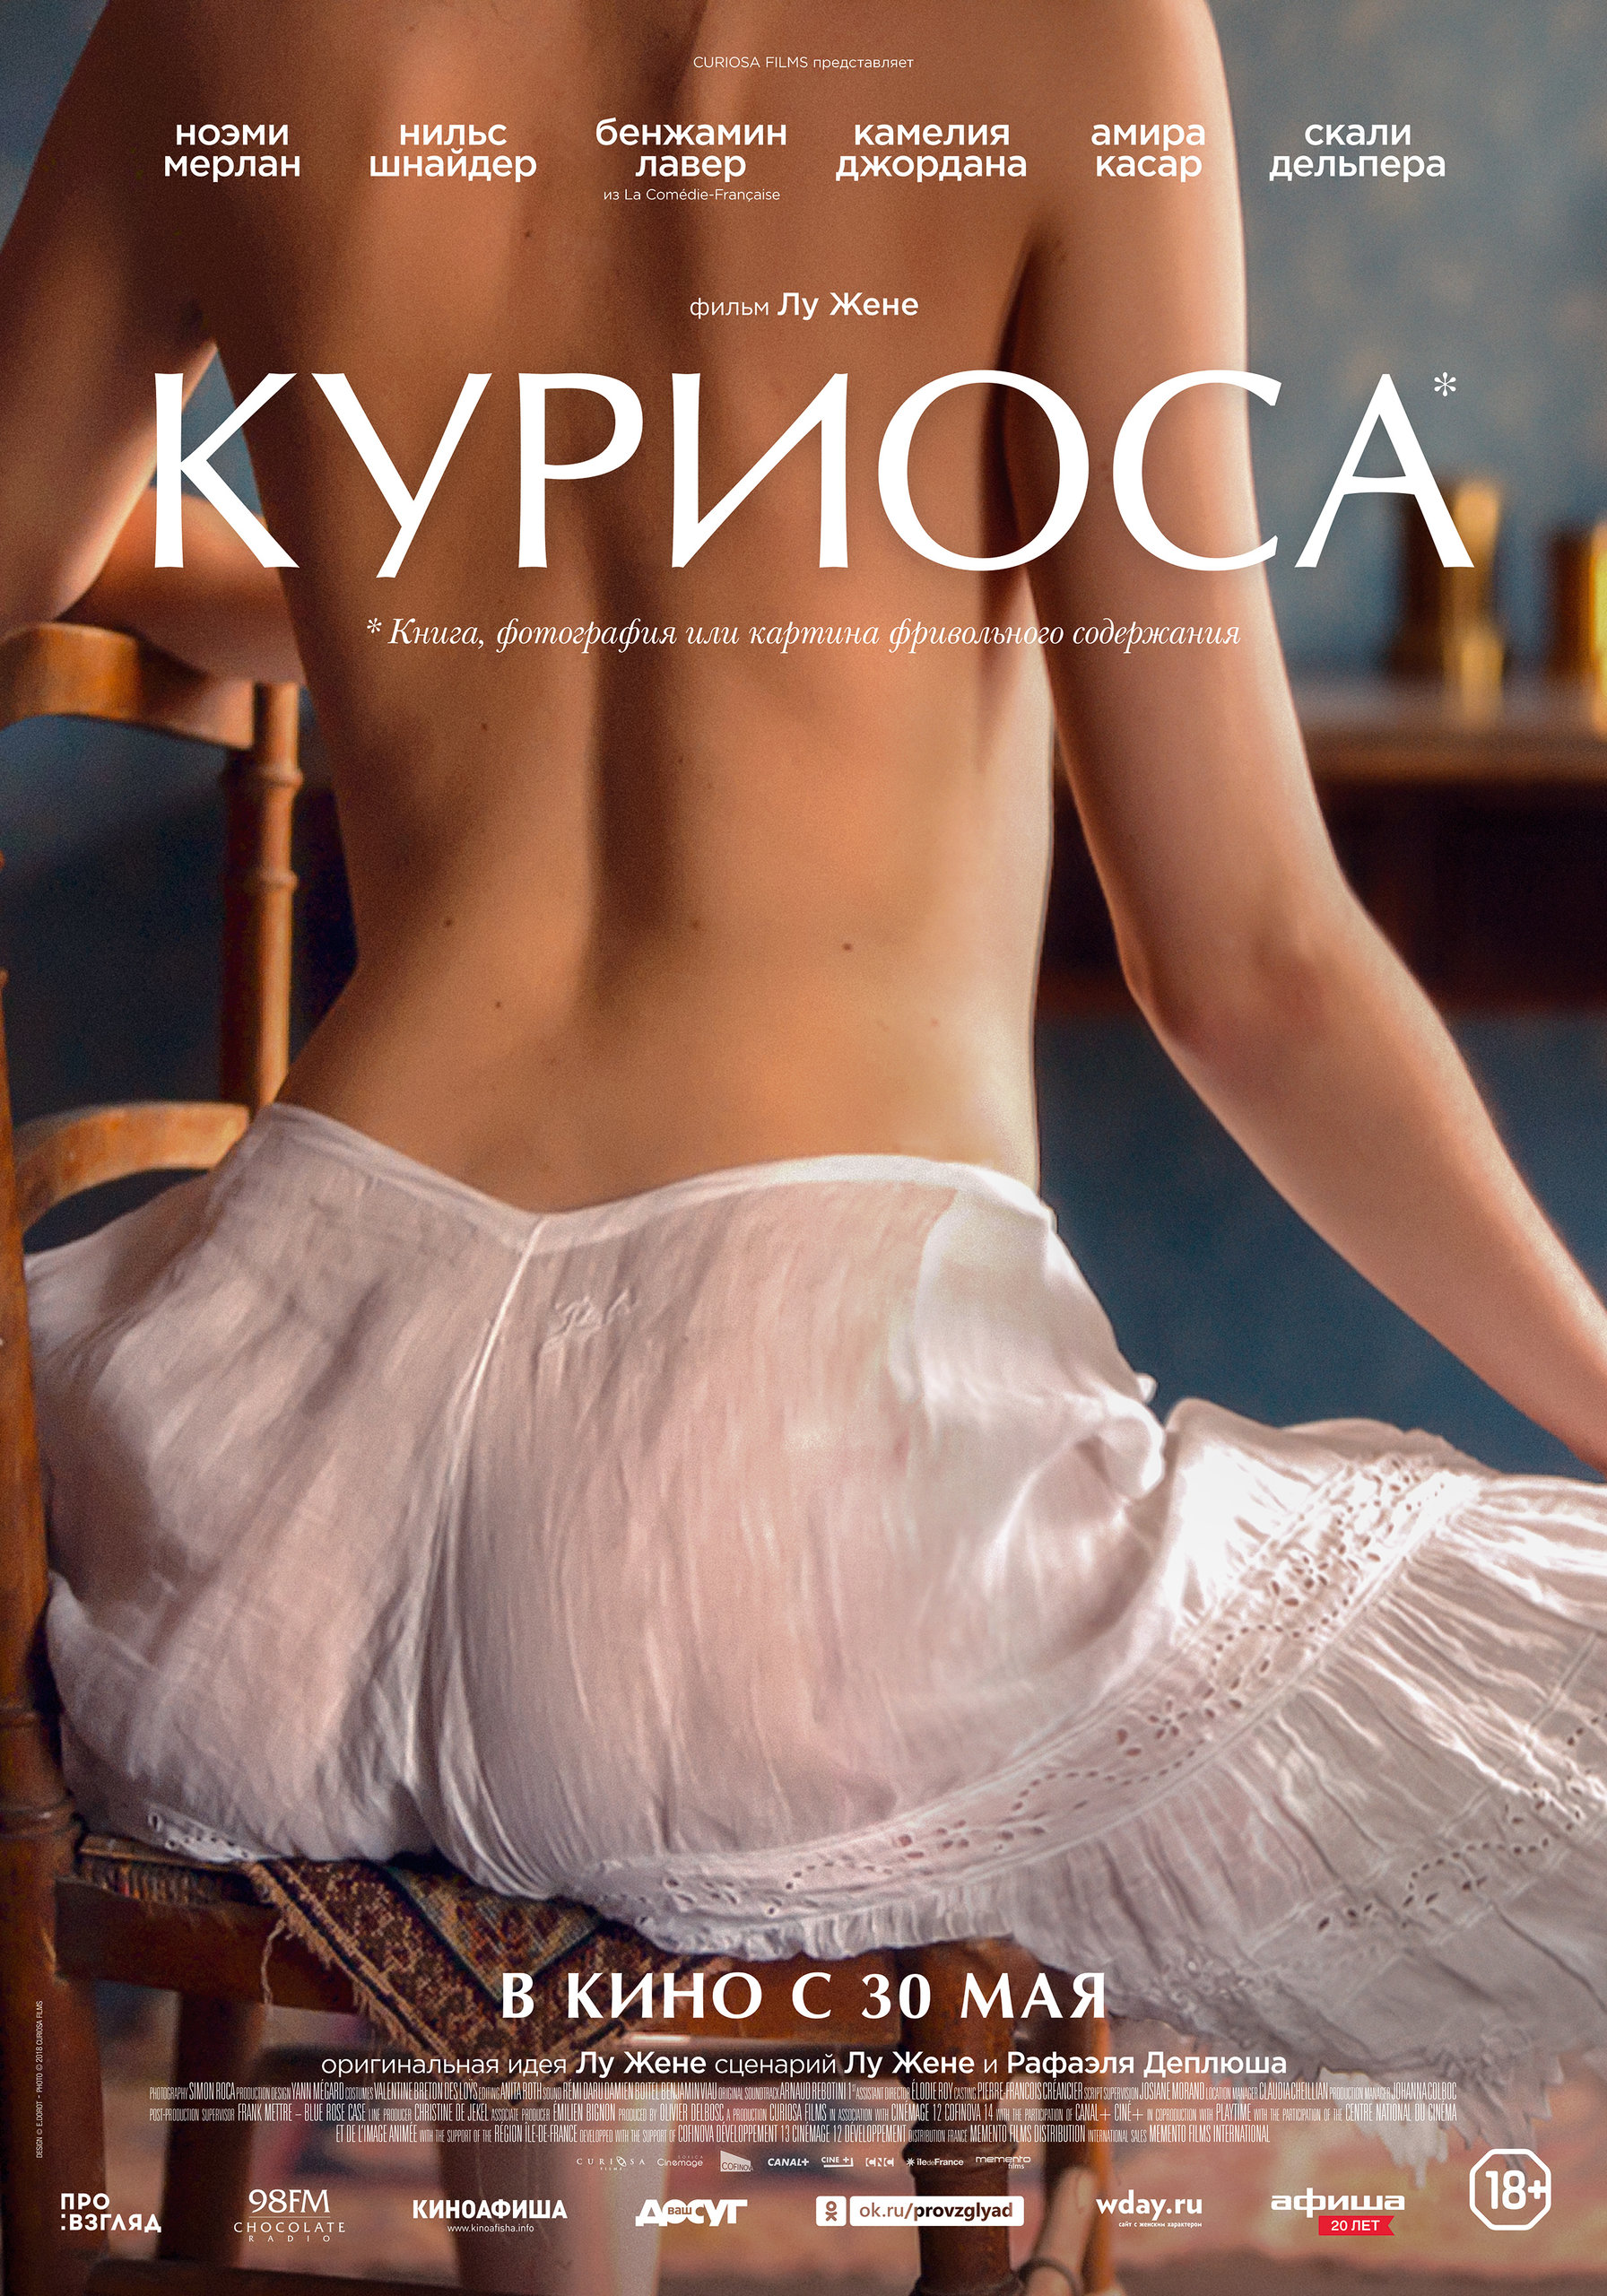 Куриоса, постер № 2